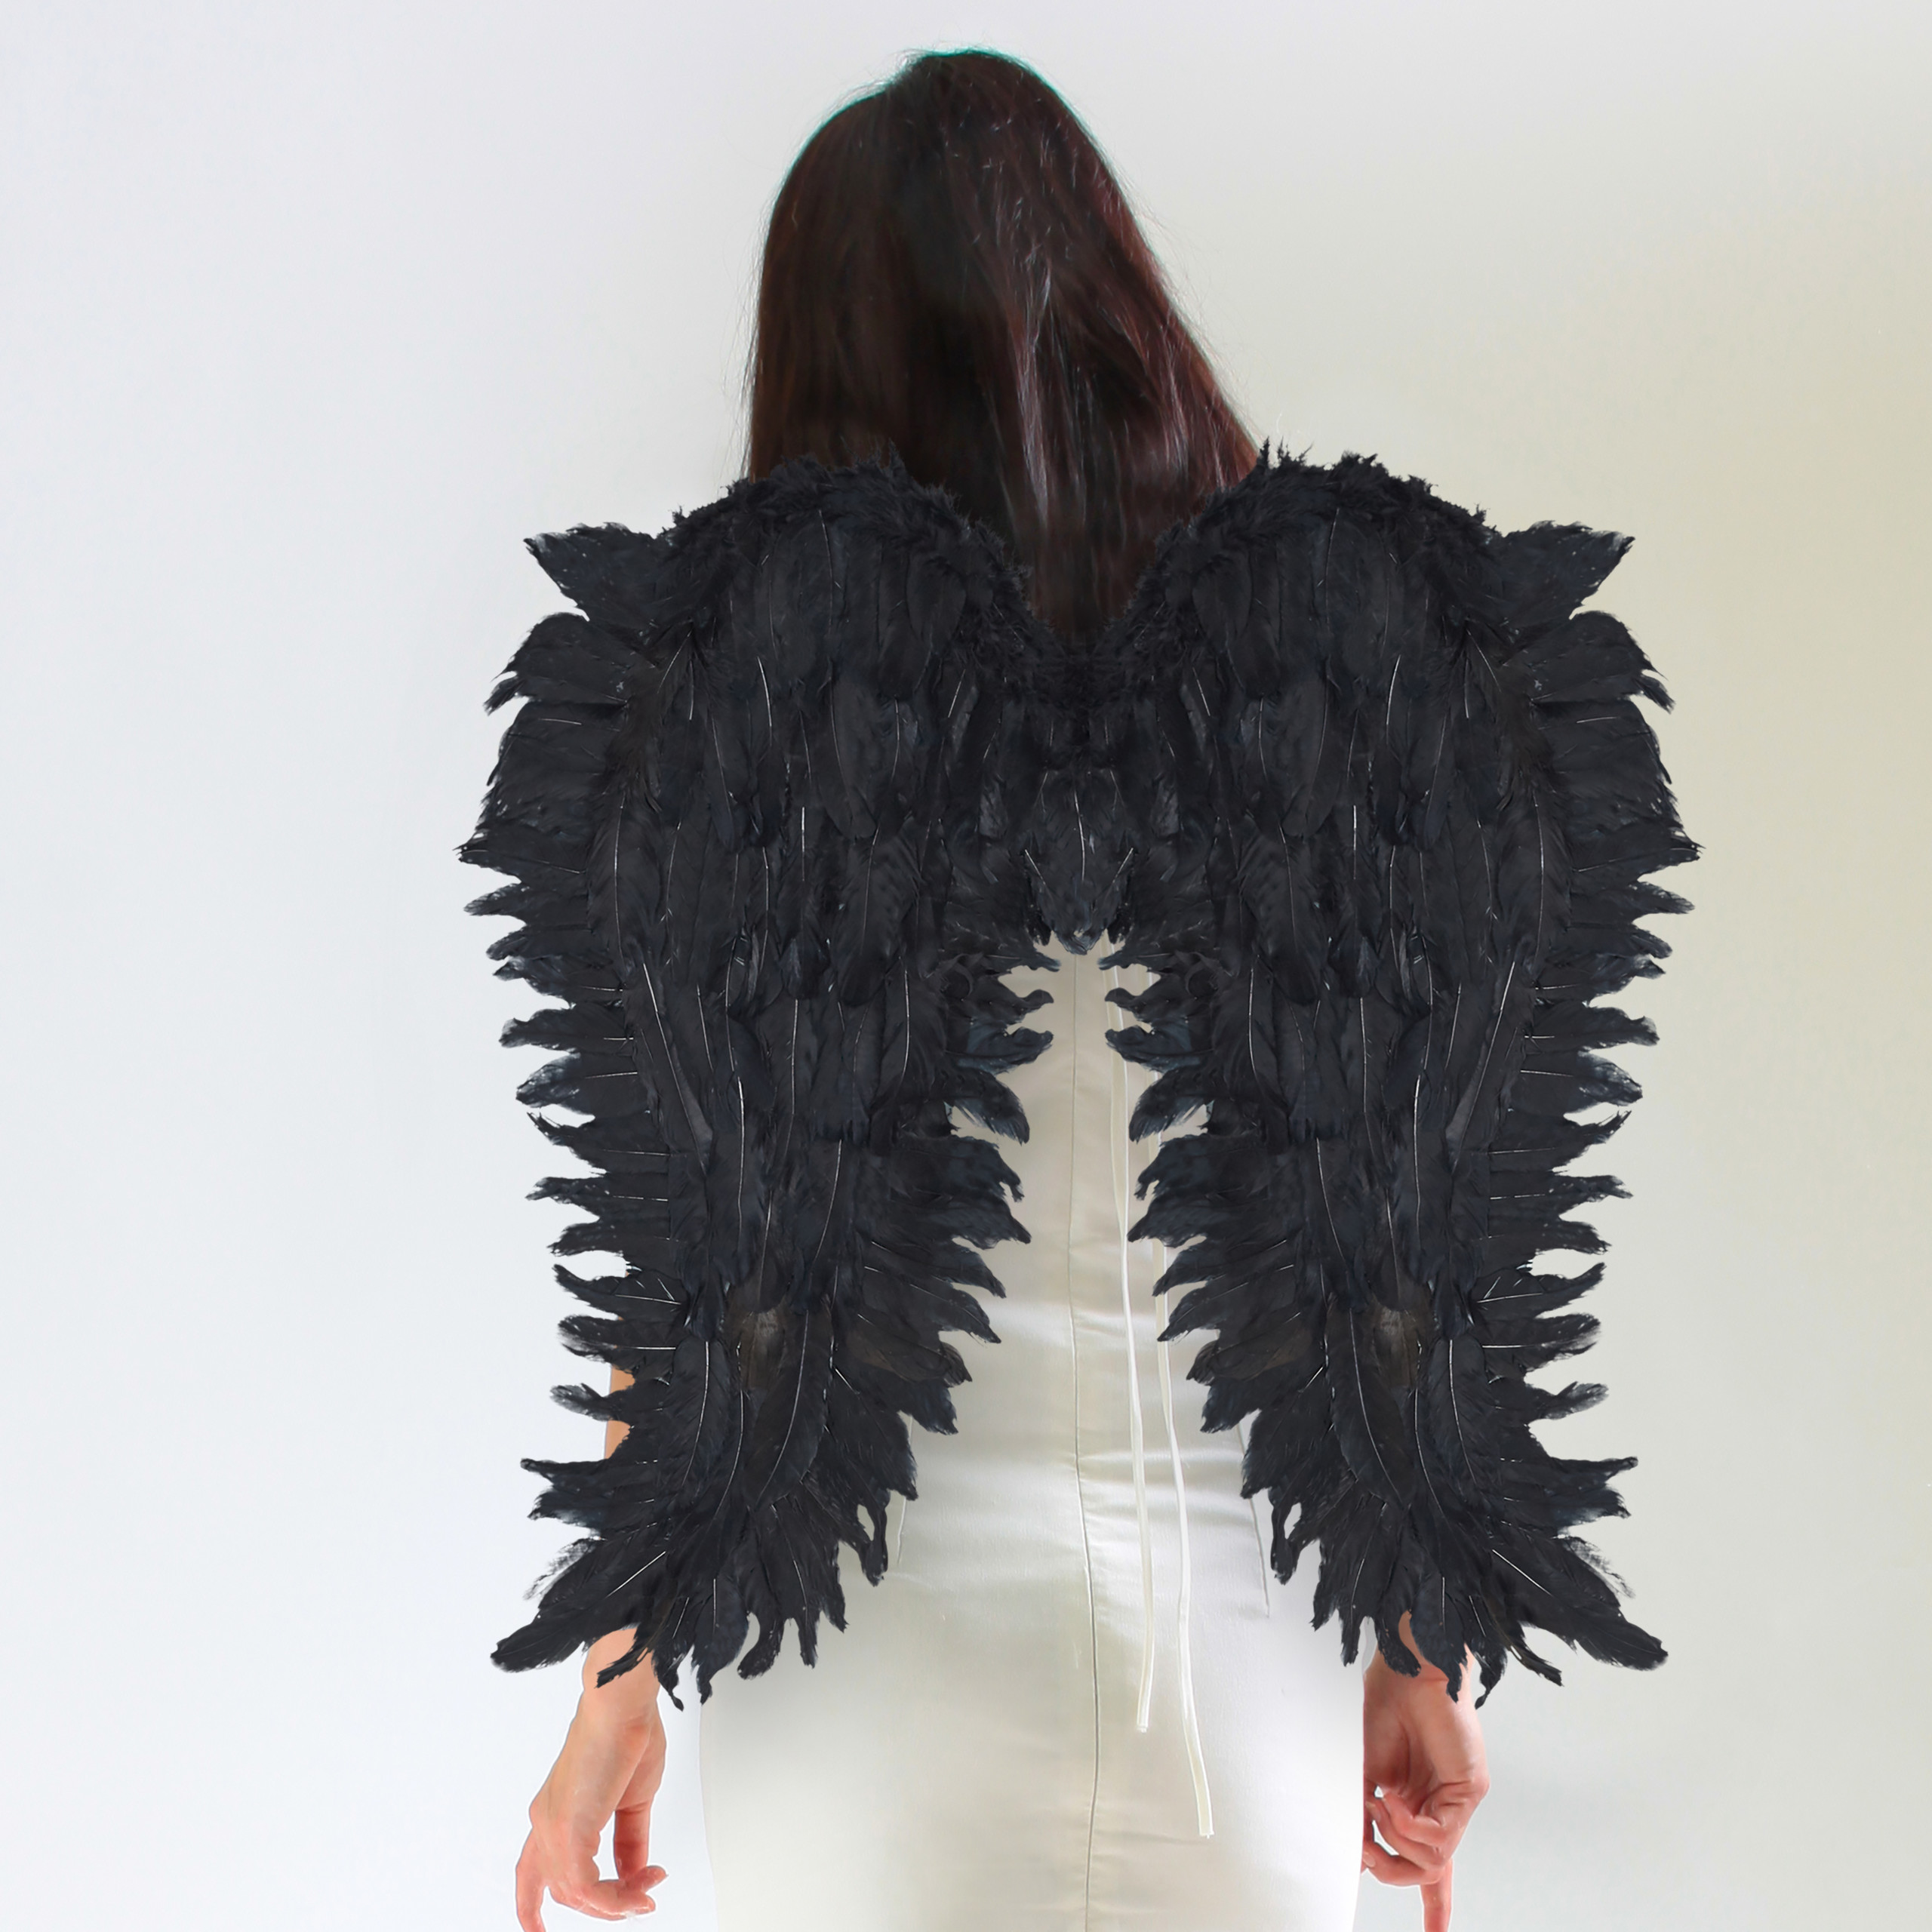 vleugels-verkleedkleding-XXL-engelenvleugels-engelkostuum-kunstveren miniatuur 10